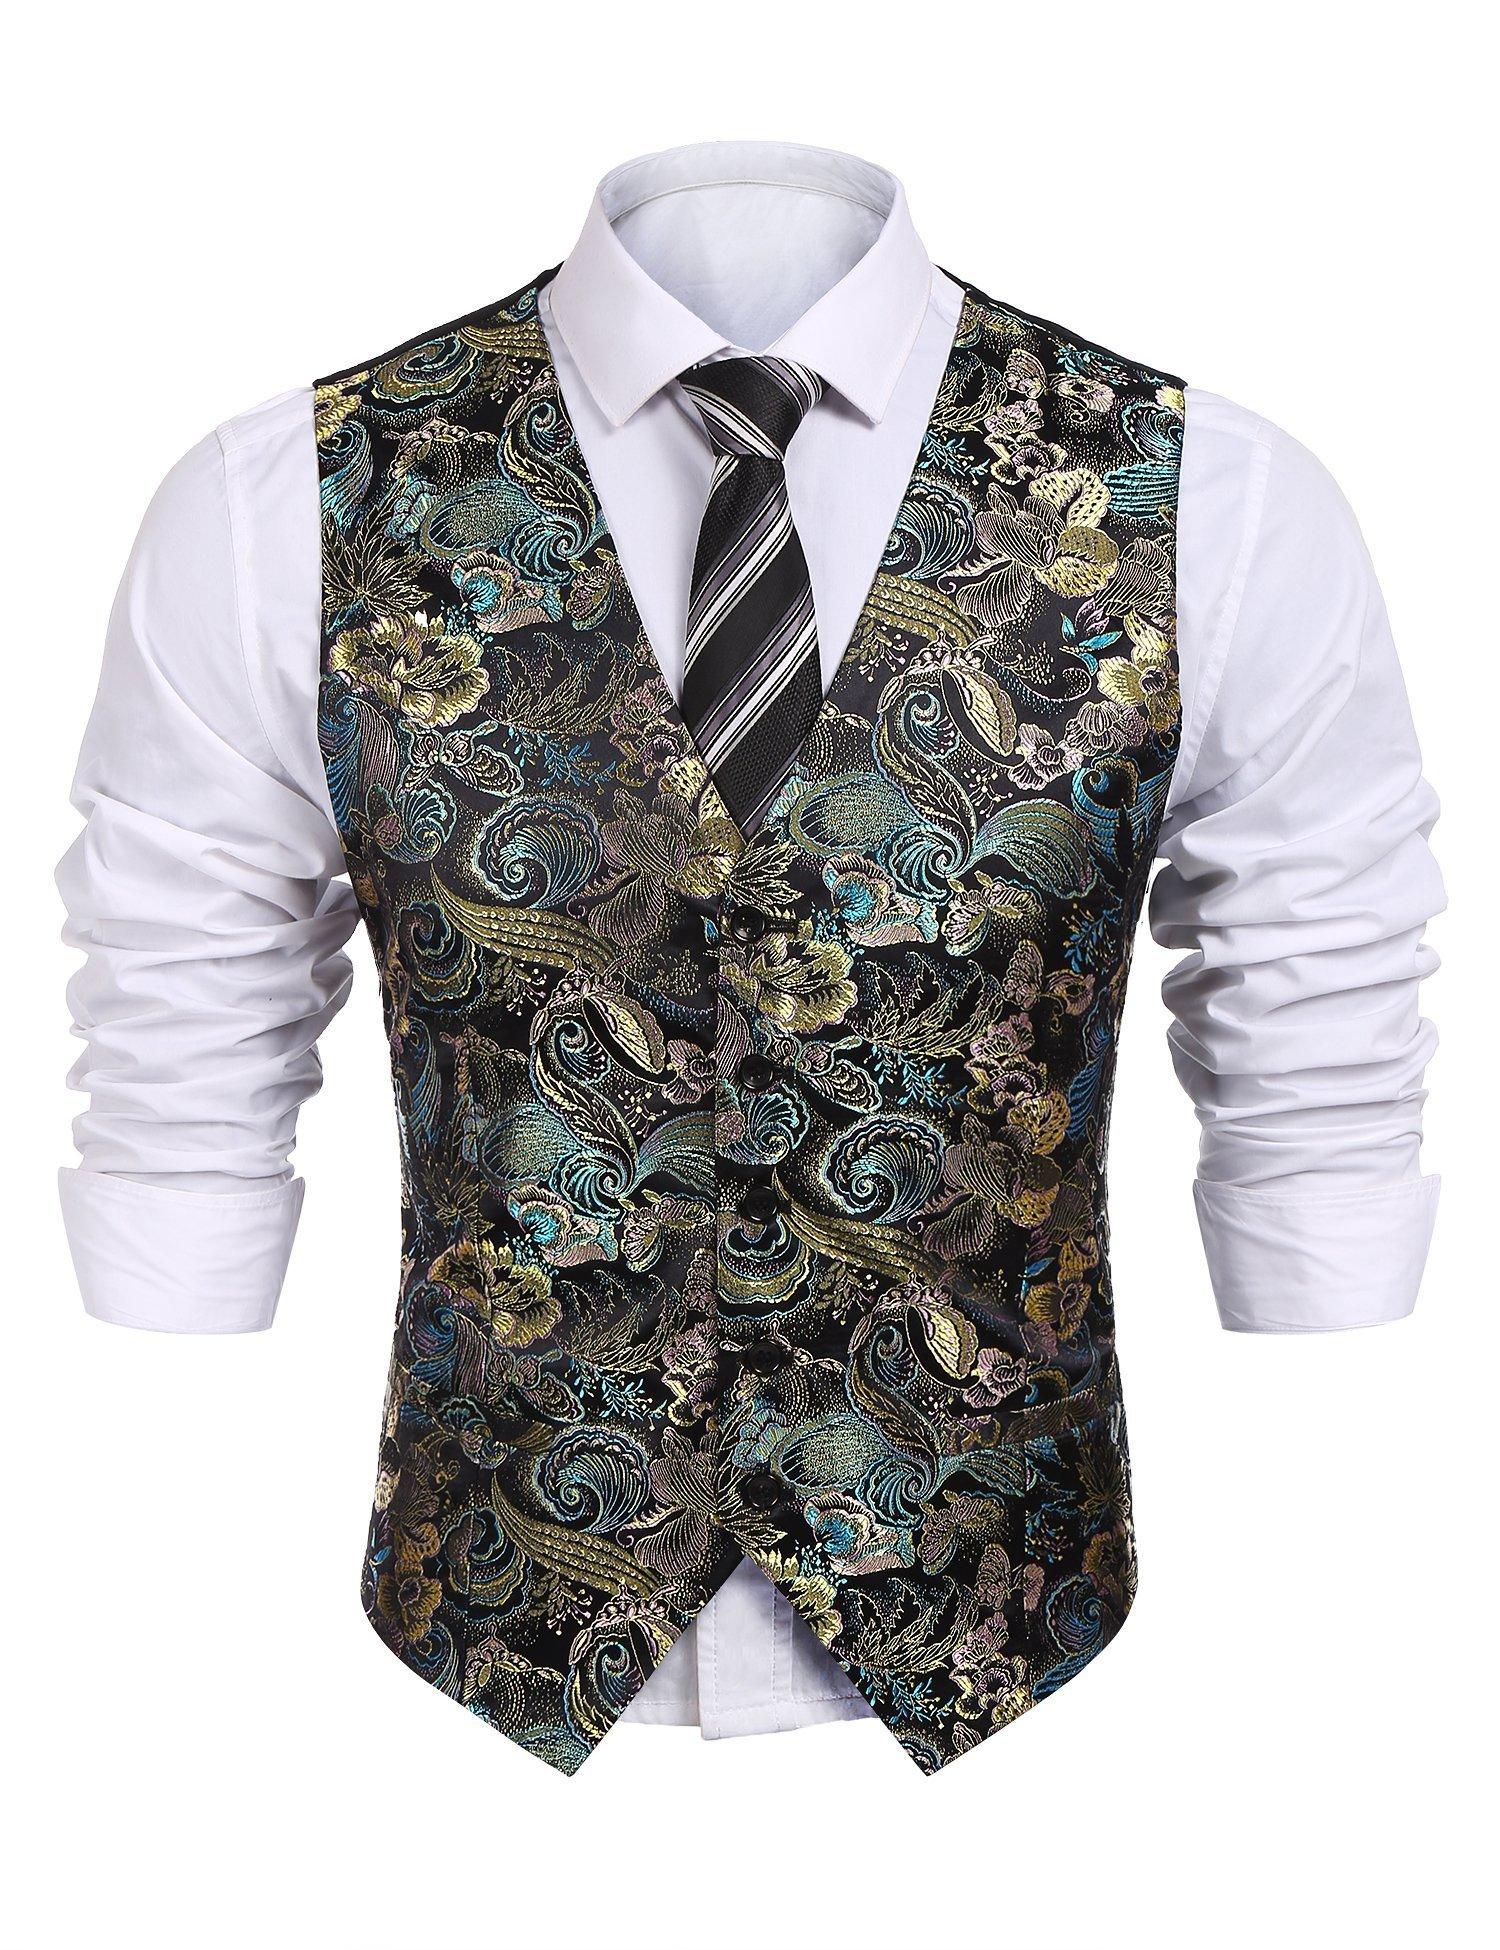 COOFANDY Mens Formal Paisley Dress Vests Dragon Graphic Fashion Waistcoat for Suit Tuxedo (XX-Large, Black)